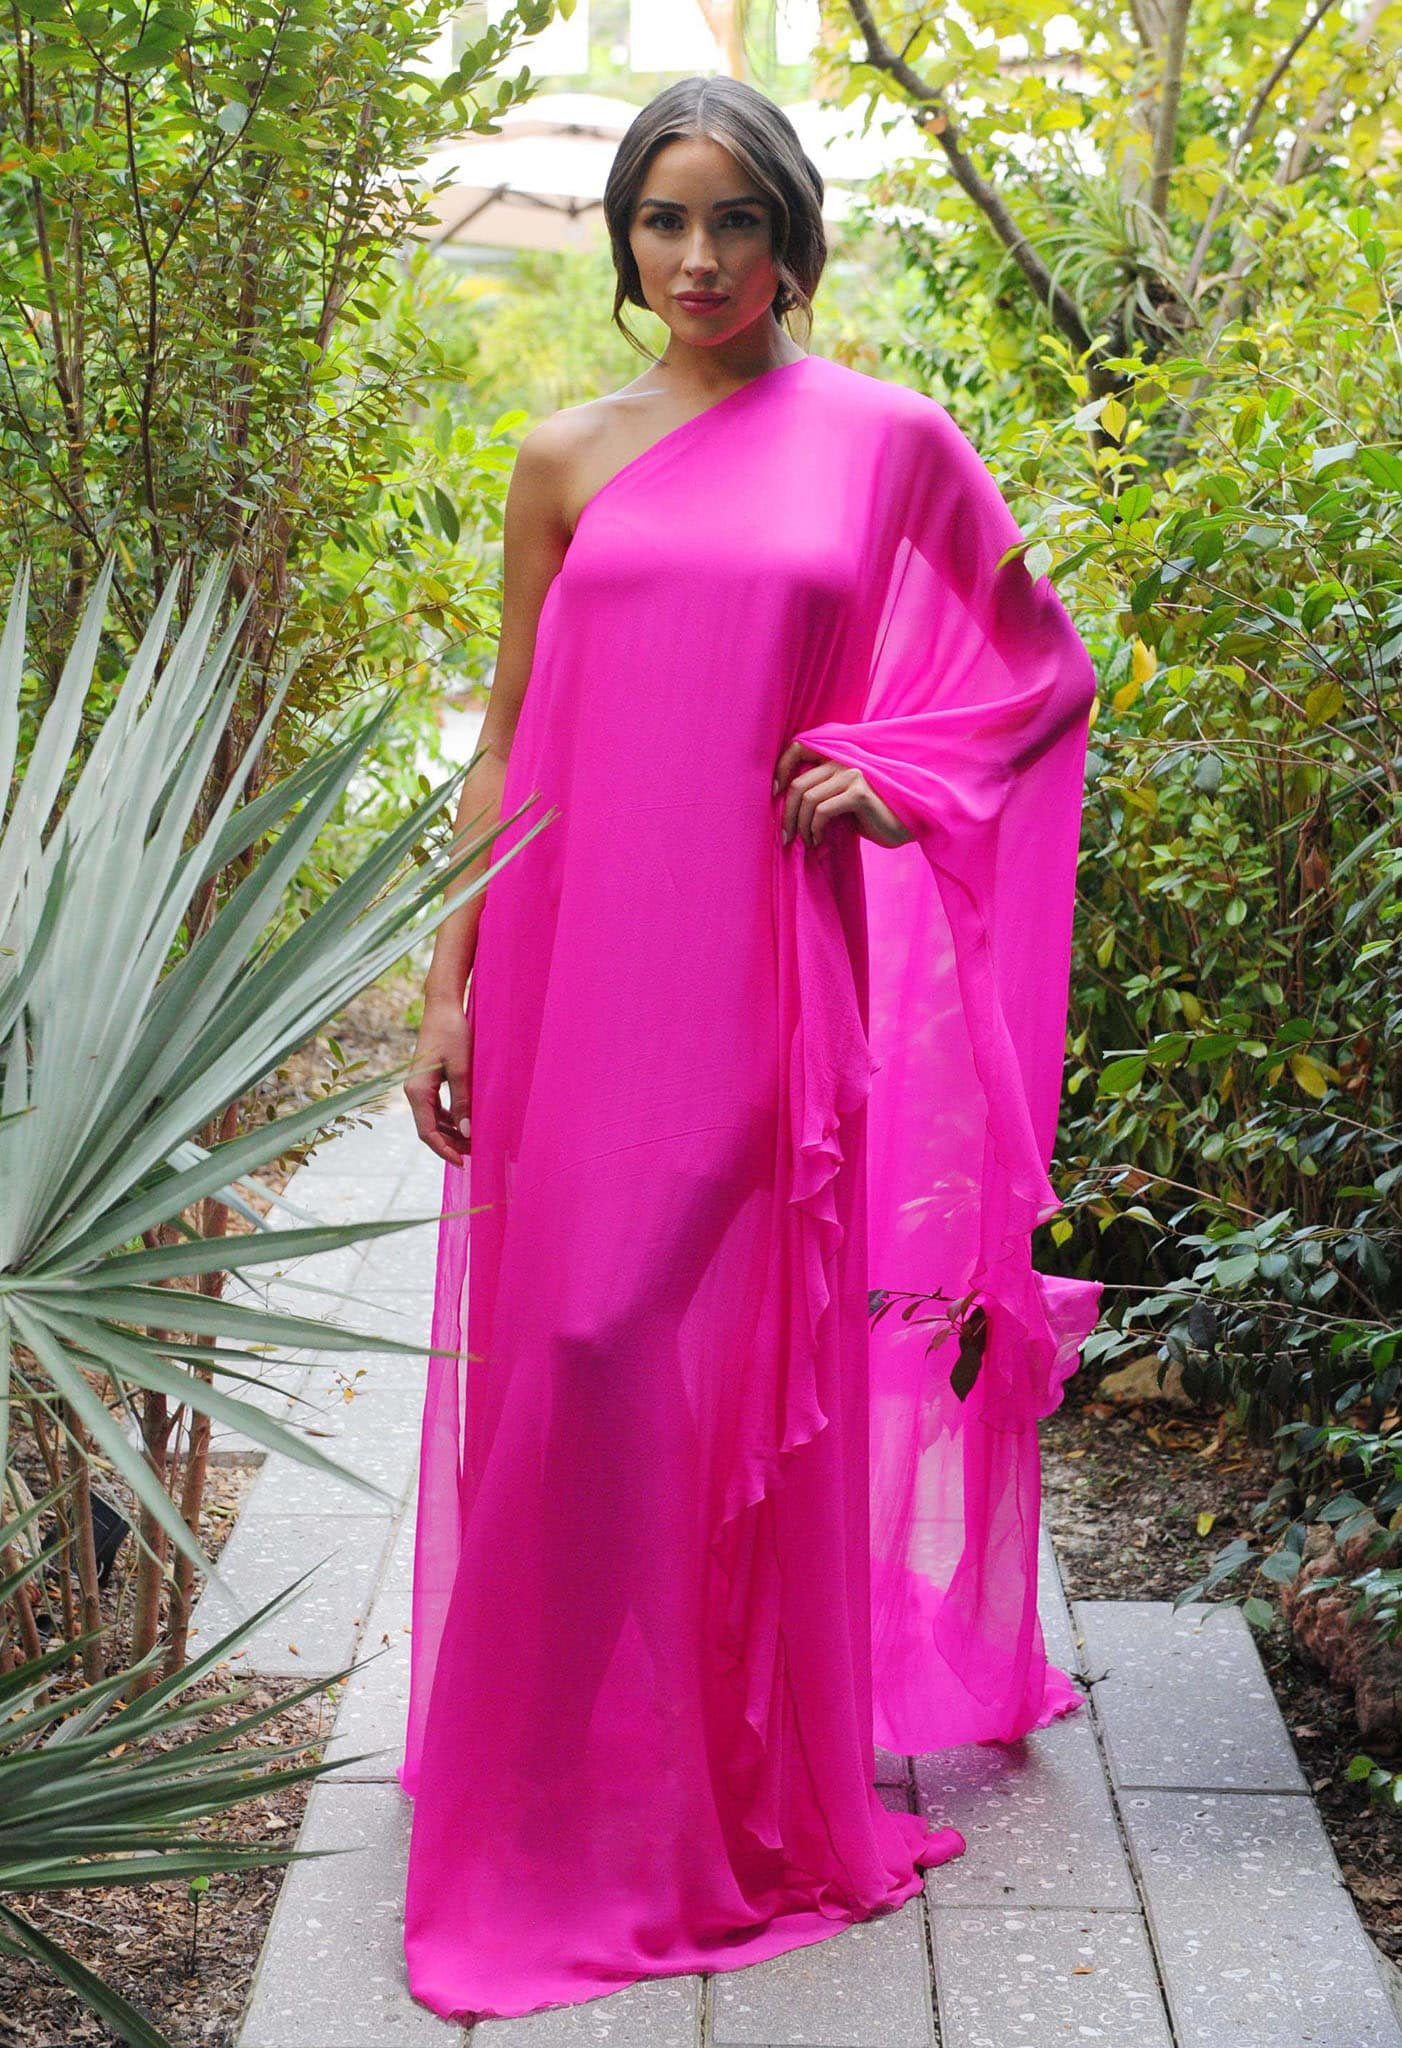 Olivia Culpo stuns in a Grecian-style fuchsia pink silk-chiffon Valentino Spring 2021 gown